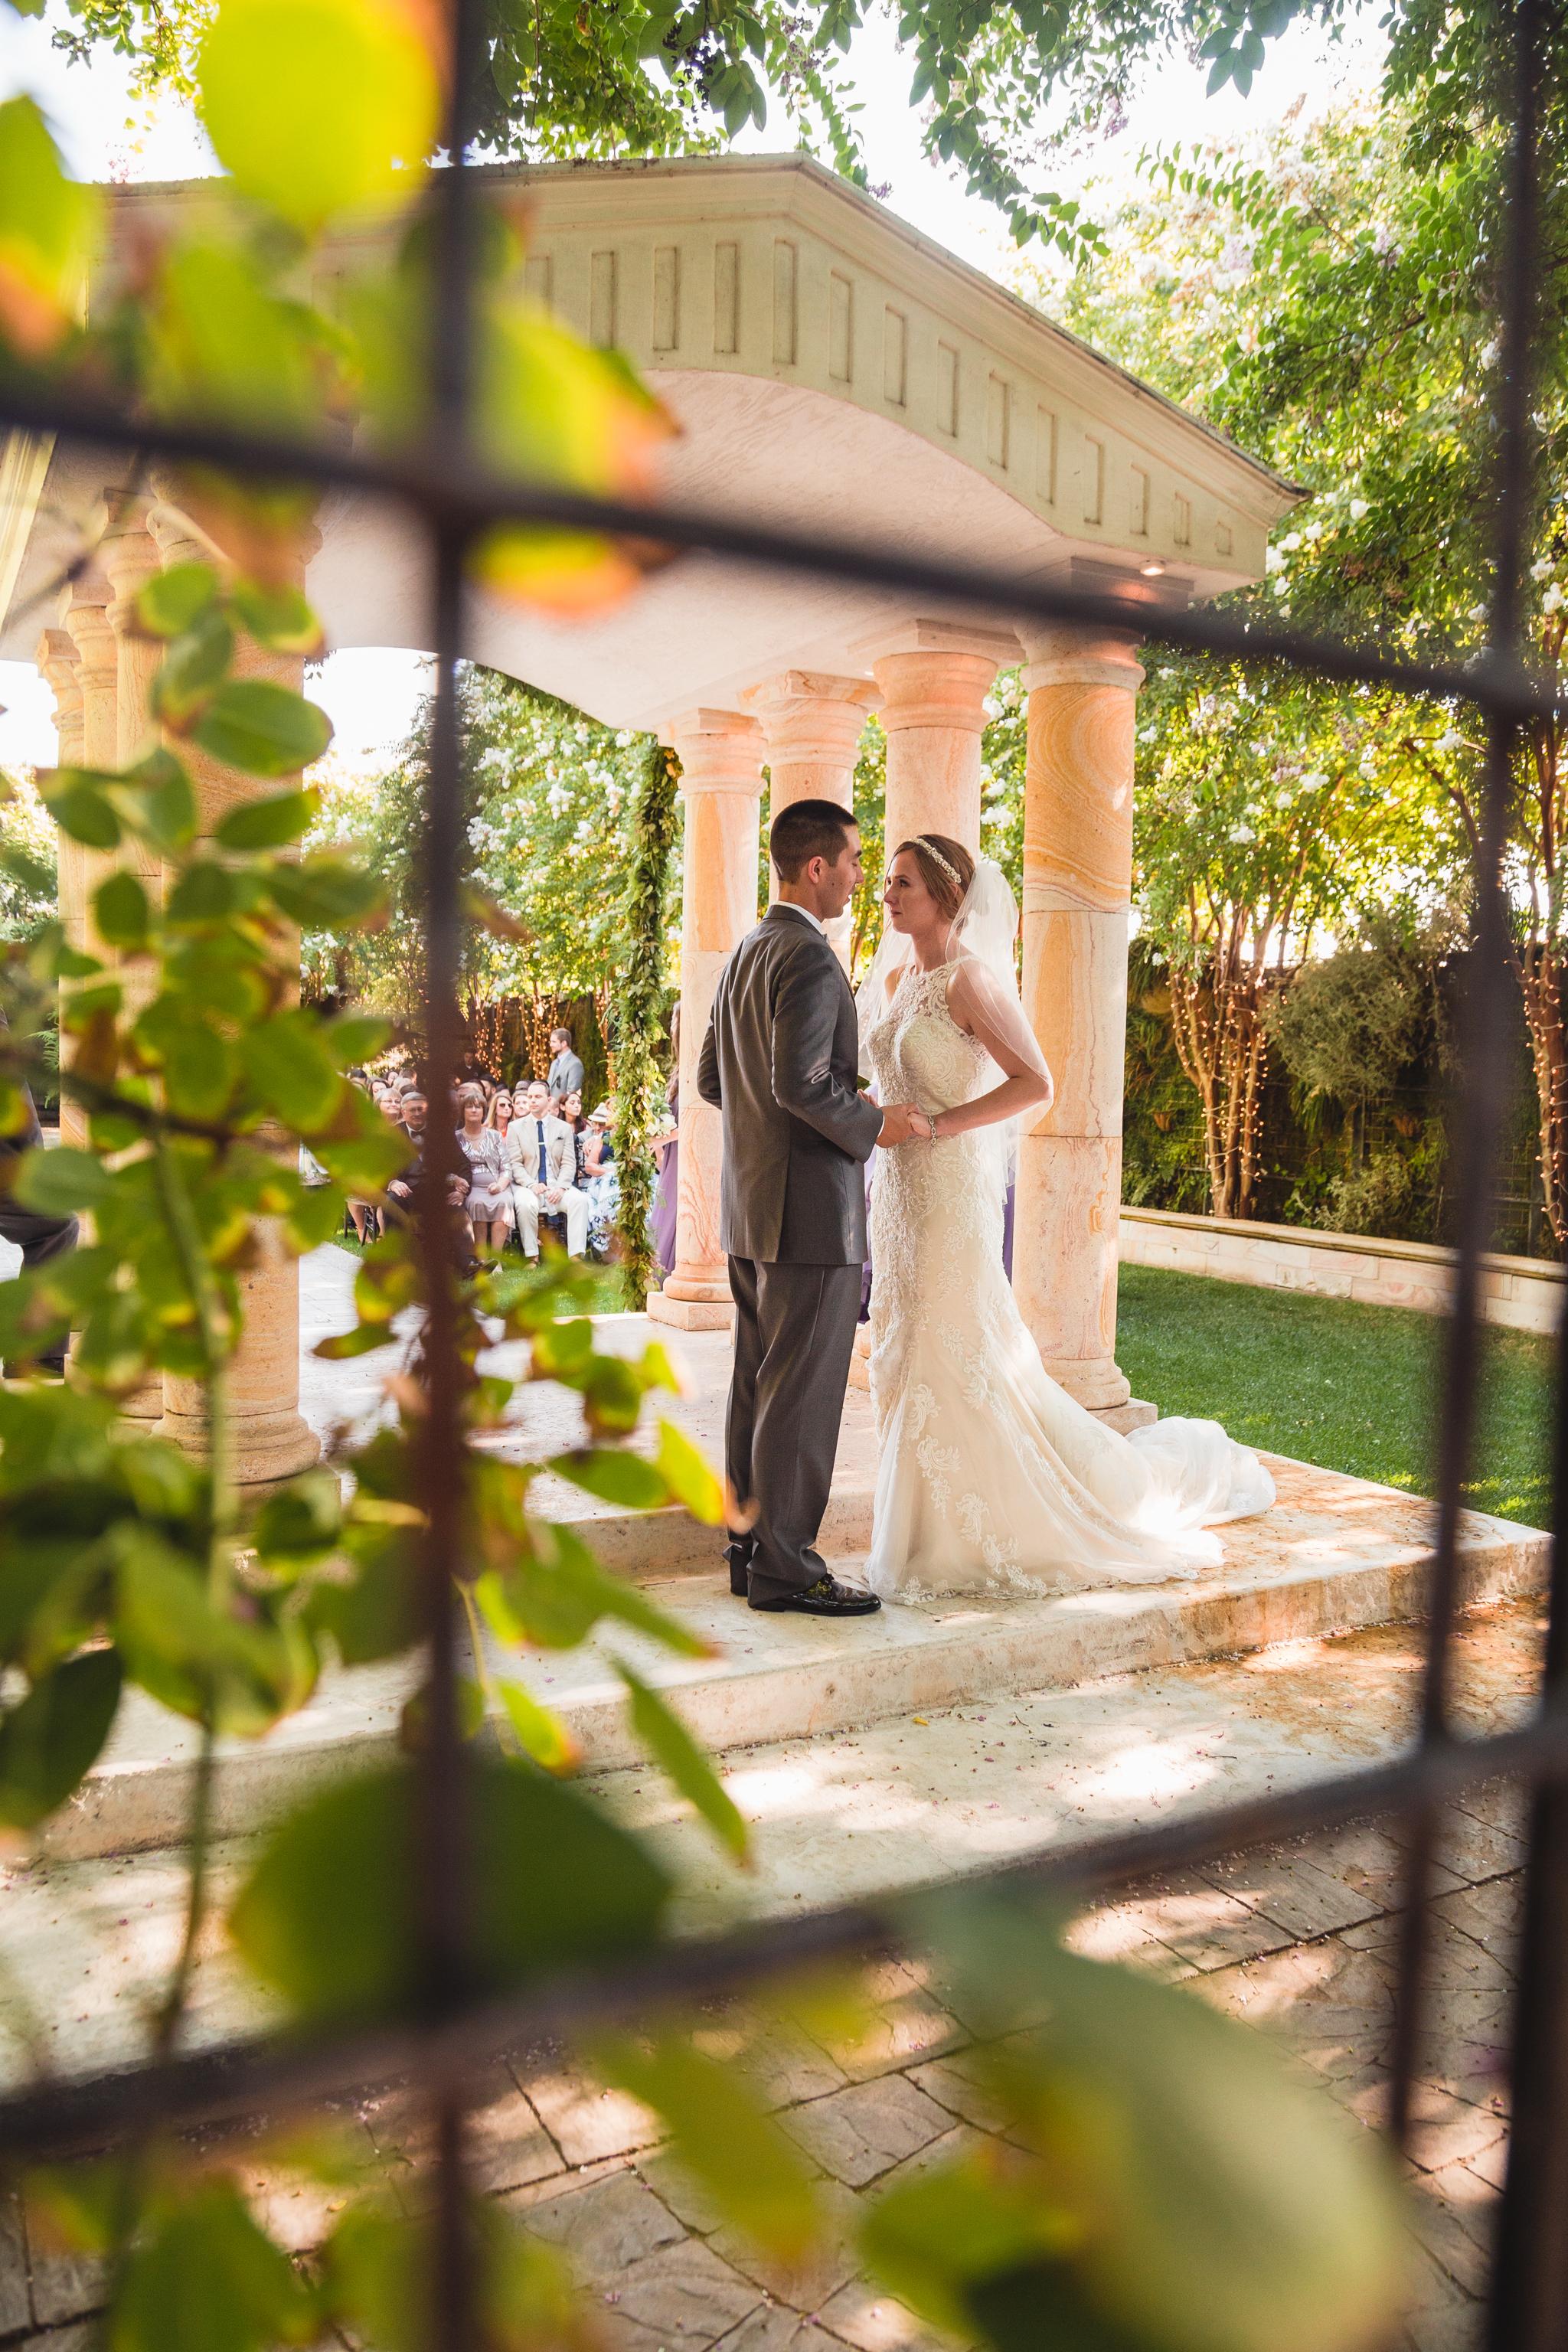 rebeccaylasotras-bay-area-garden-wedding-39.jpg